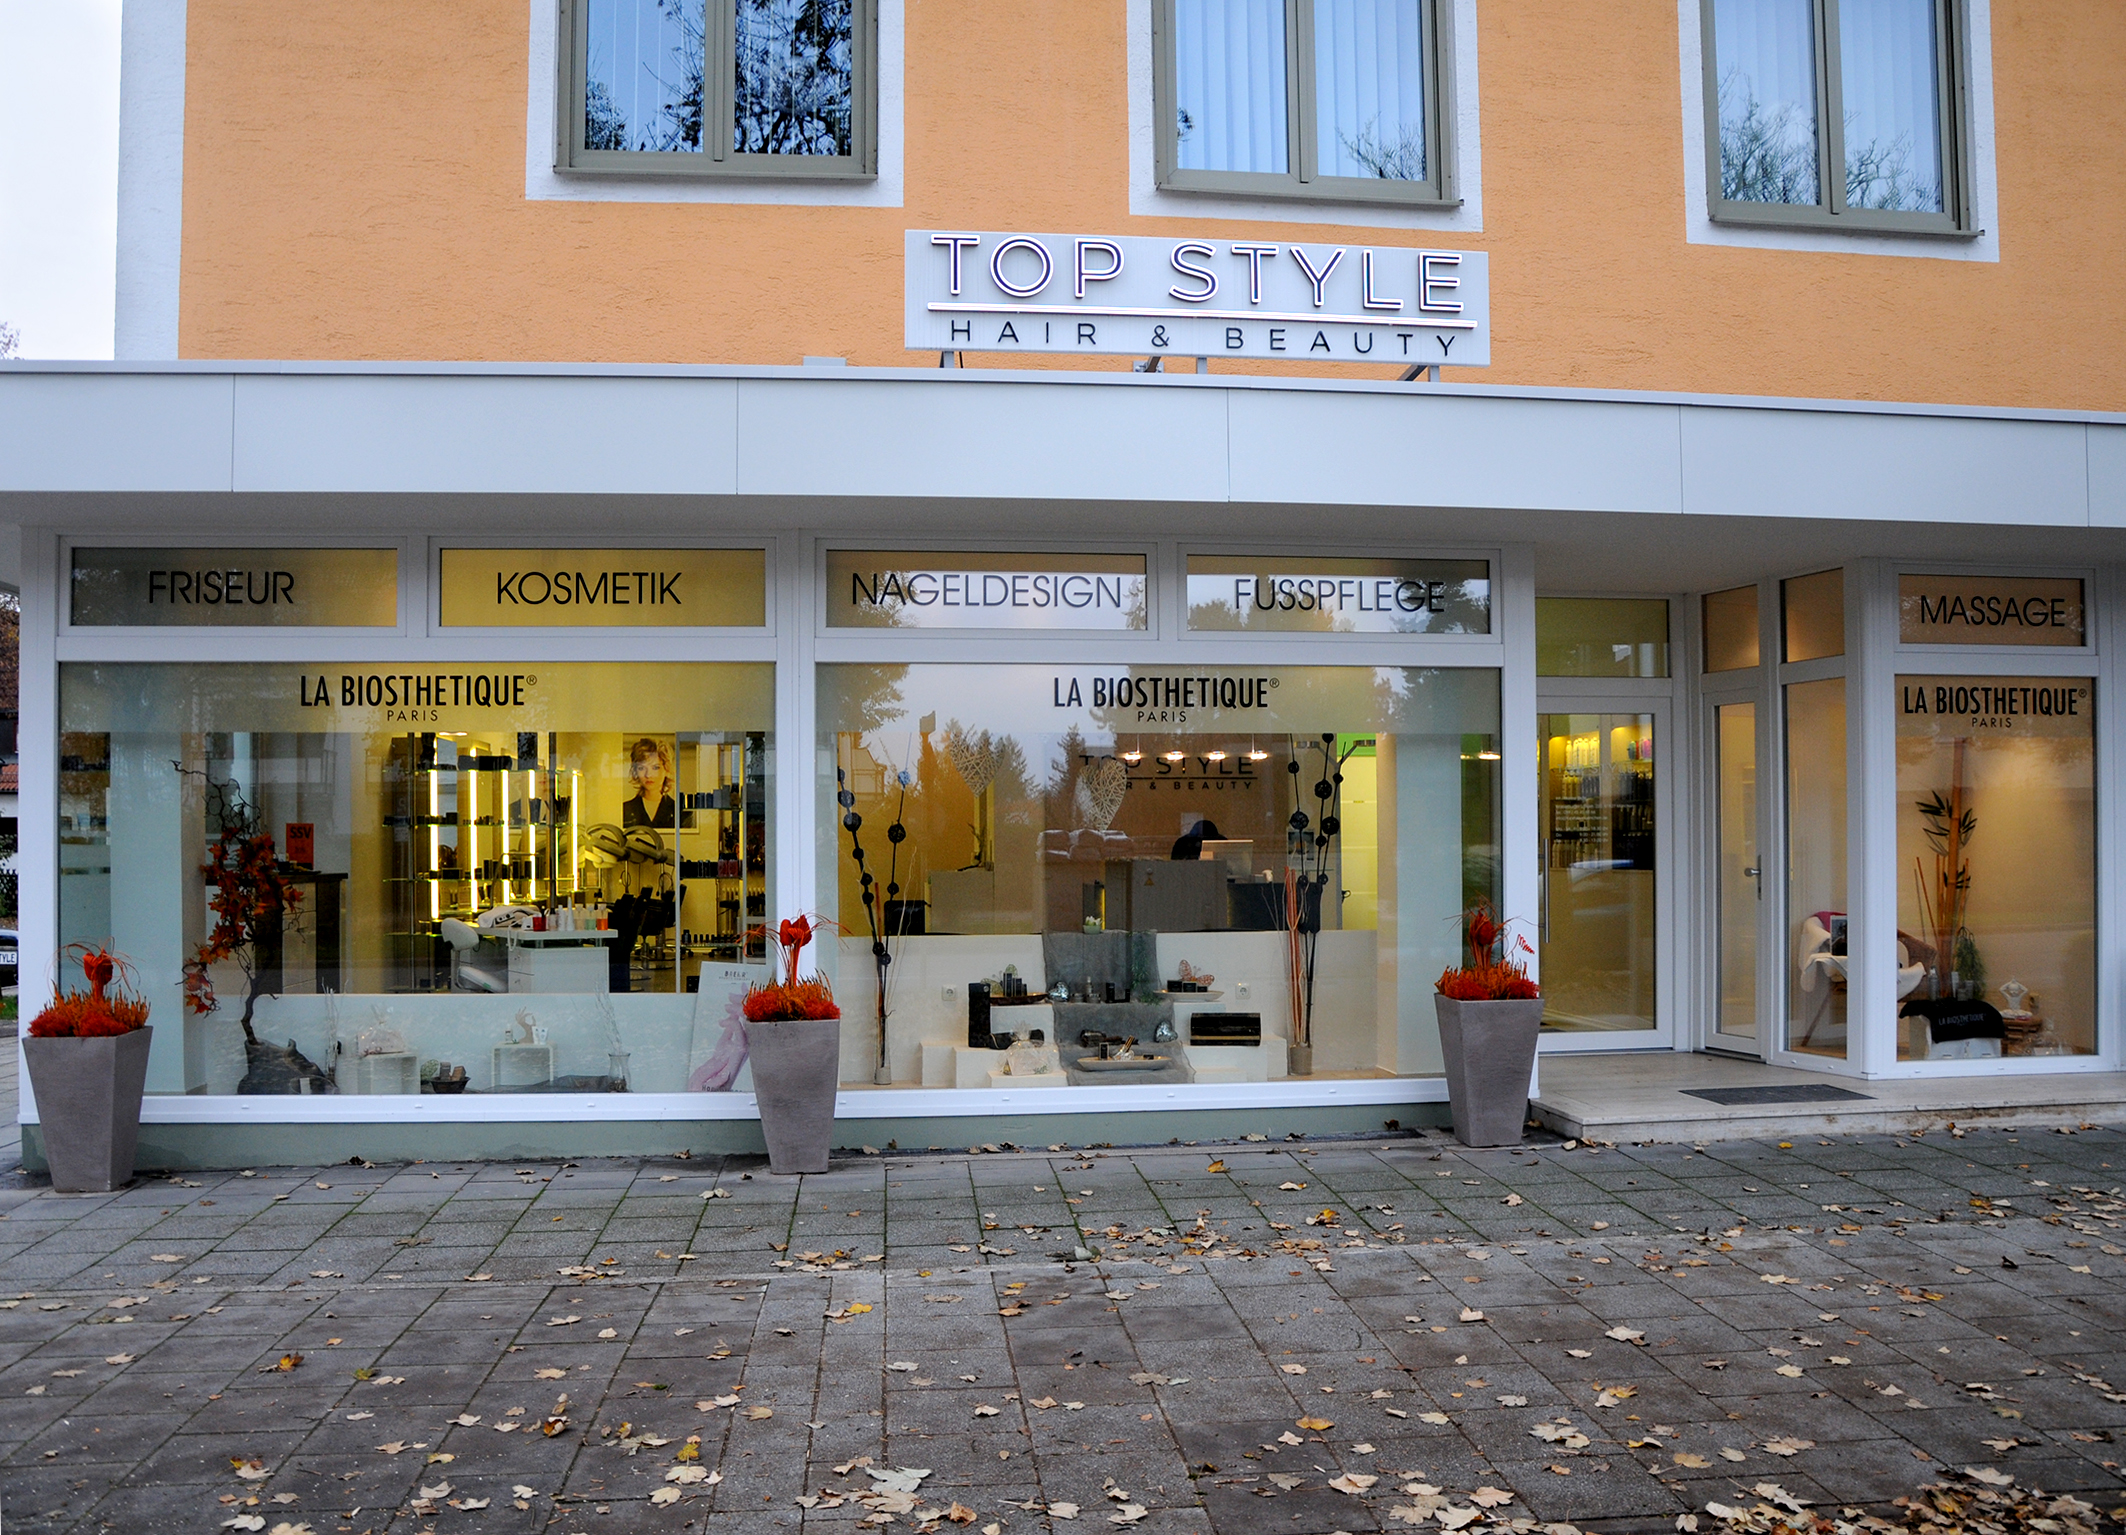 top style hair beauty m nchen kontakt. Black Bedroom Furniture Sets. Home Design Ideas